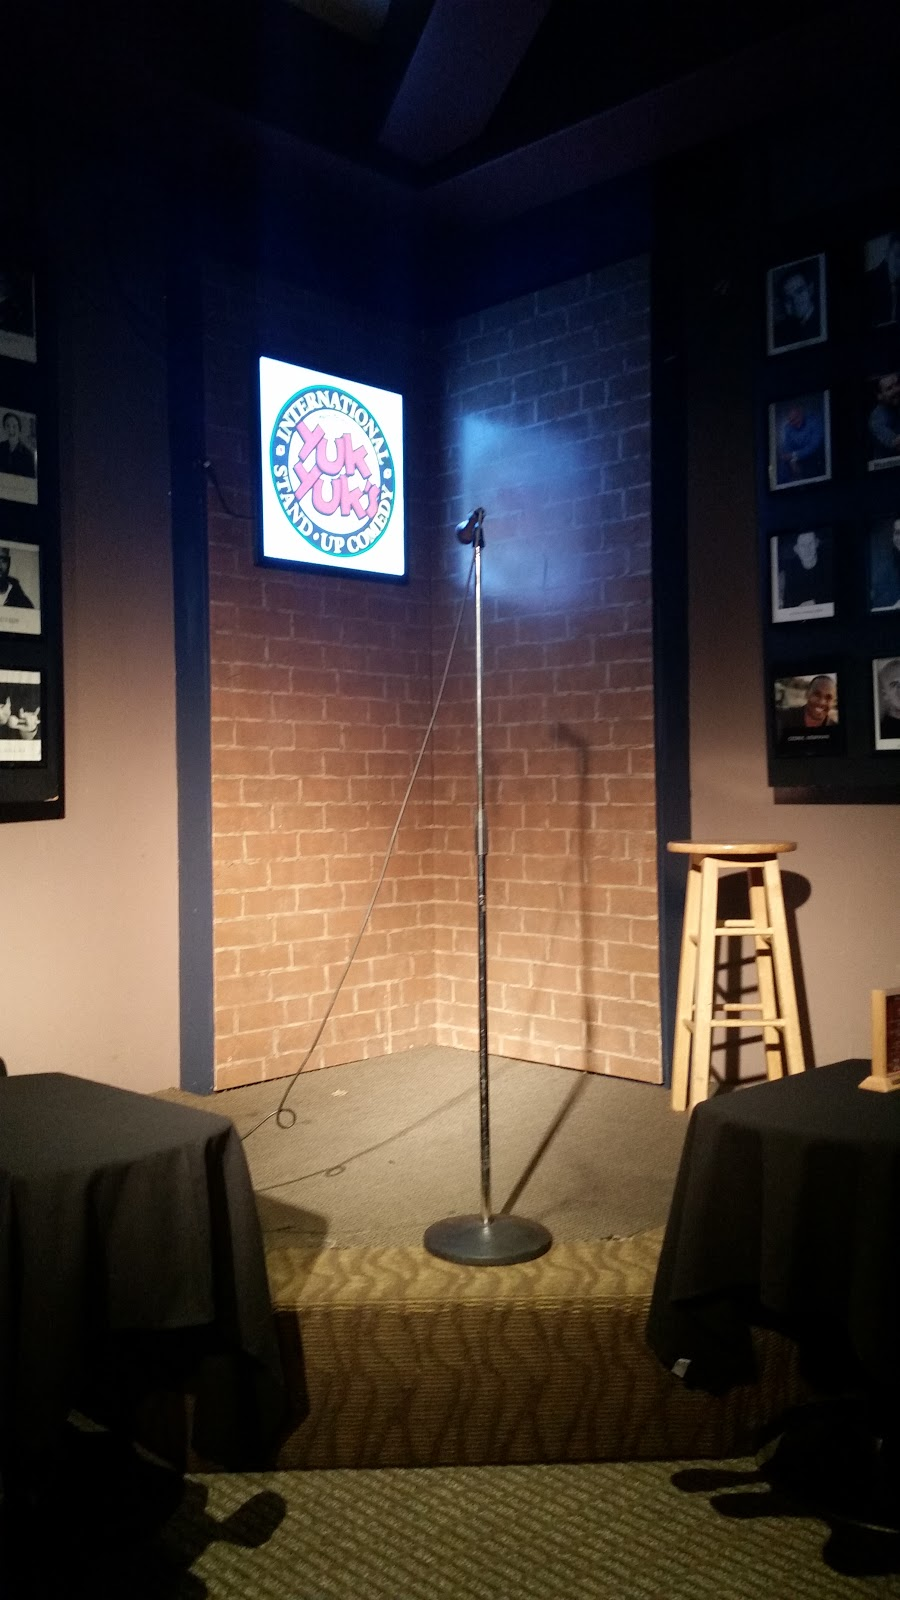 Yuk Yuks Halifax Comedy Club | lodging | 1181 Hollis St, Halifax, NS B3H 2P6, Canada | 9024299857 OR +1 902-429-9857